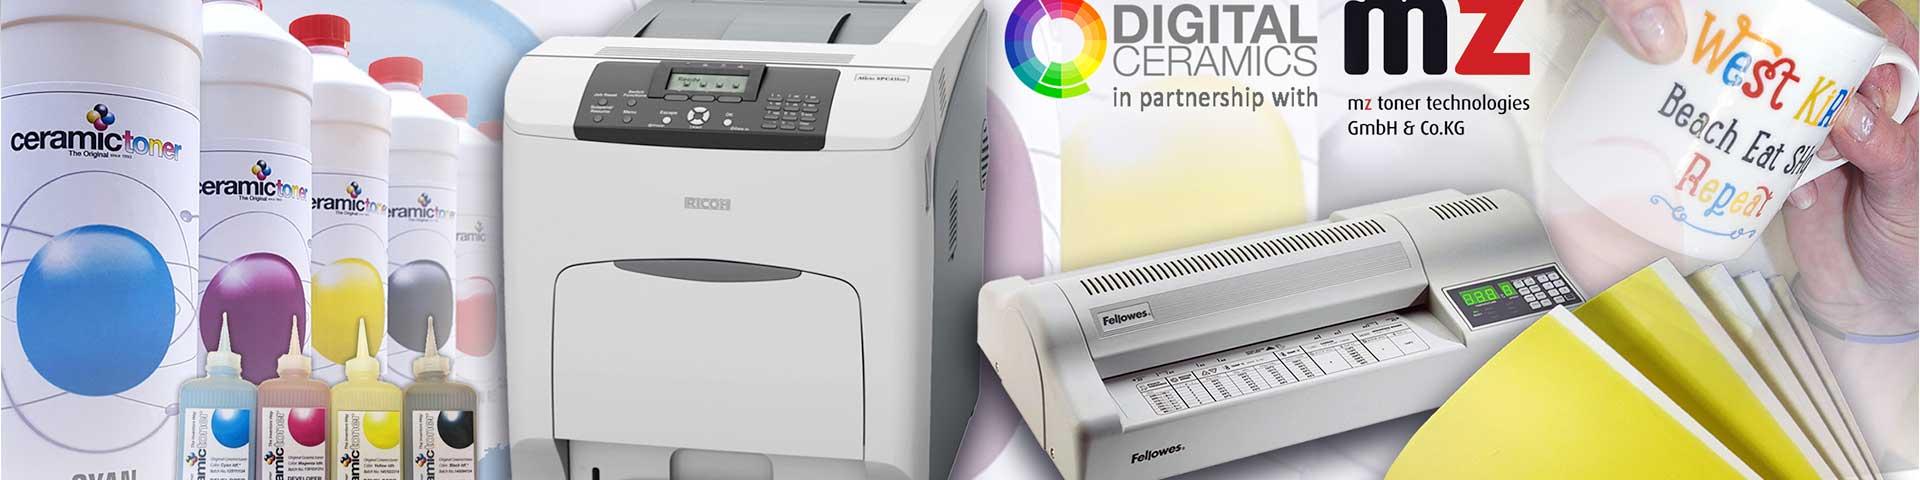 Ceramic Printer Bundles